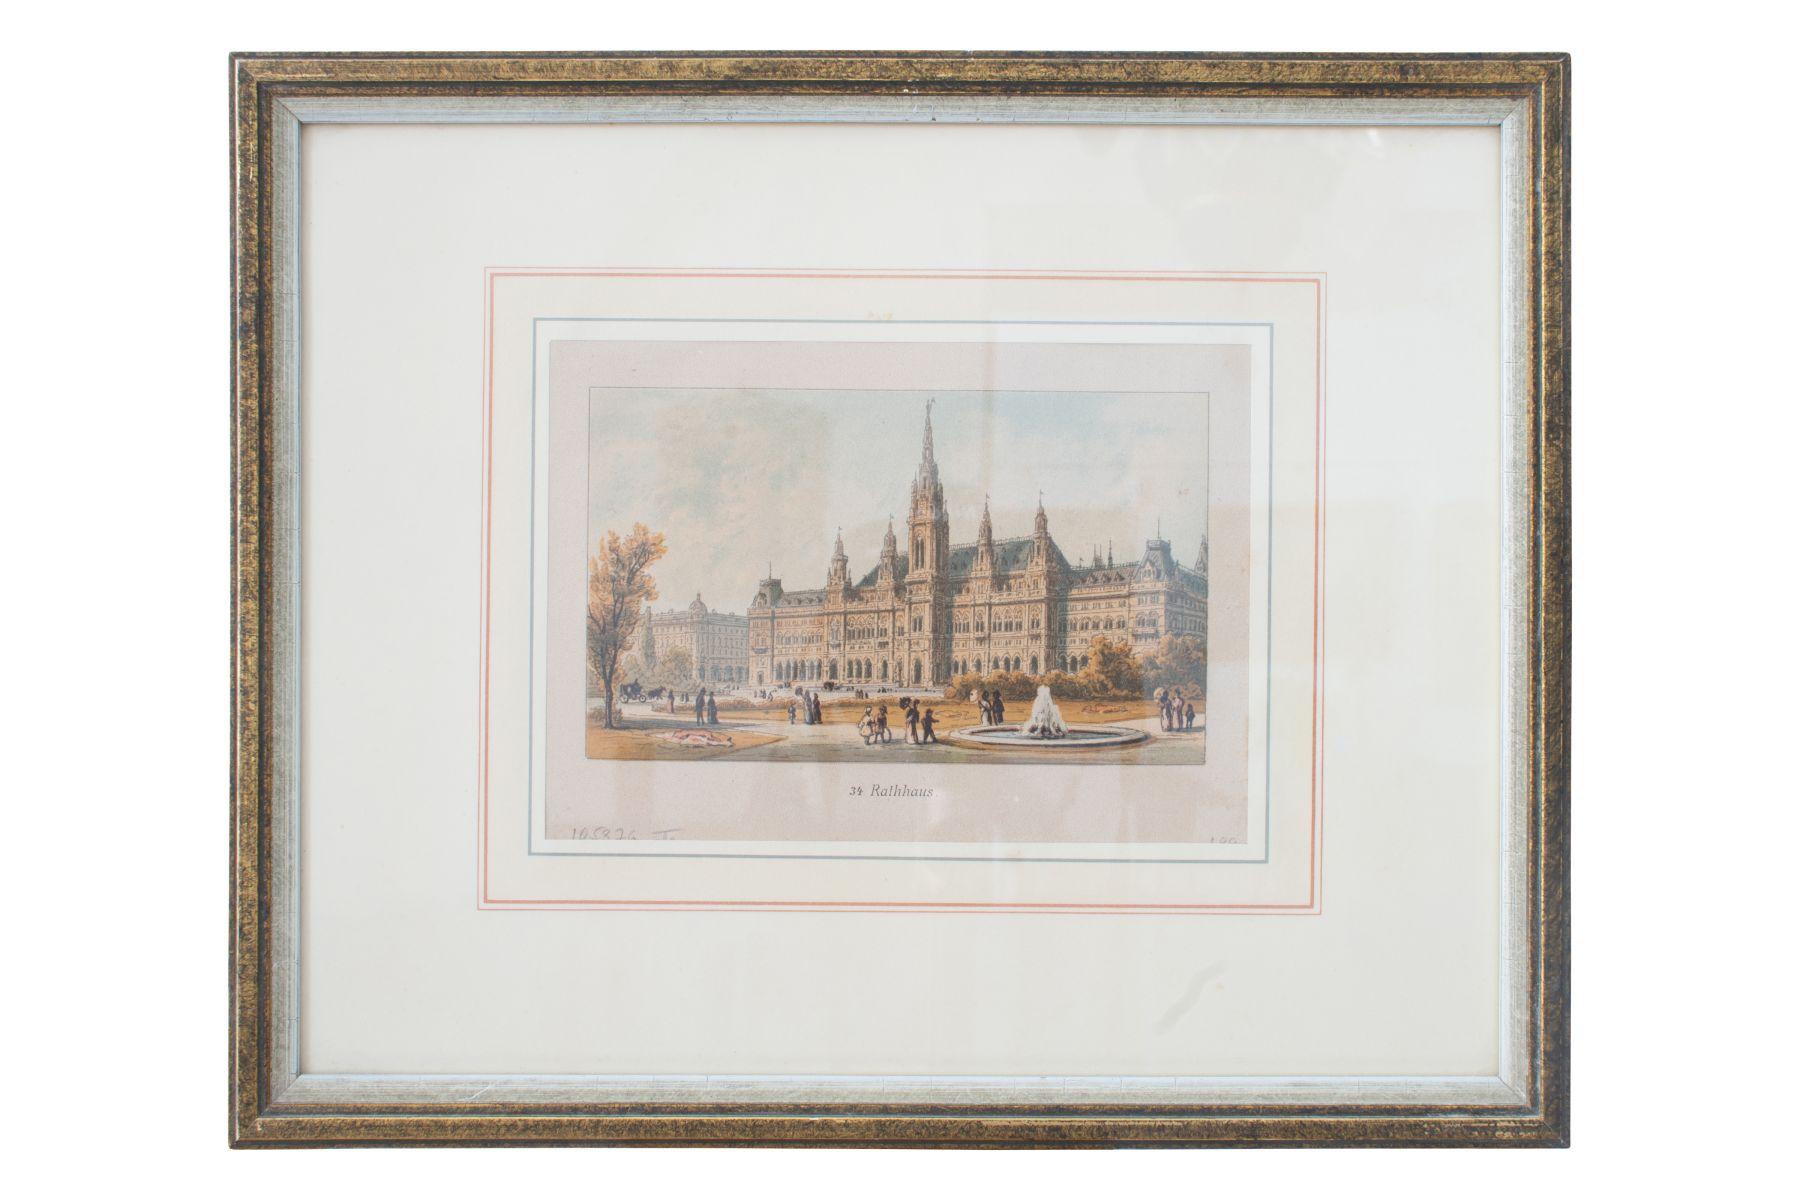 "#72 Johann Varrone (1832-1910) and Eugen Ladislaus Petrovits (1839-1907) ""Vienna City Hall"" | Johann Varrone (1832-1910) und Eugen Ladislaus Petrovits (1839-1907) ""Rathaus Wien"" Image"